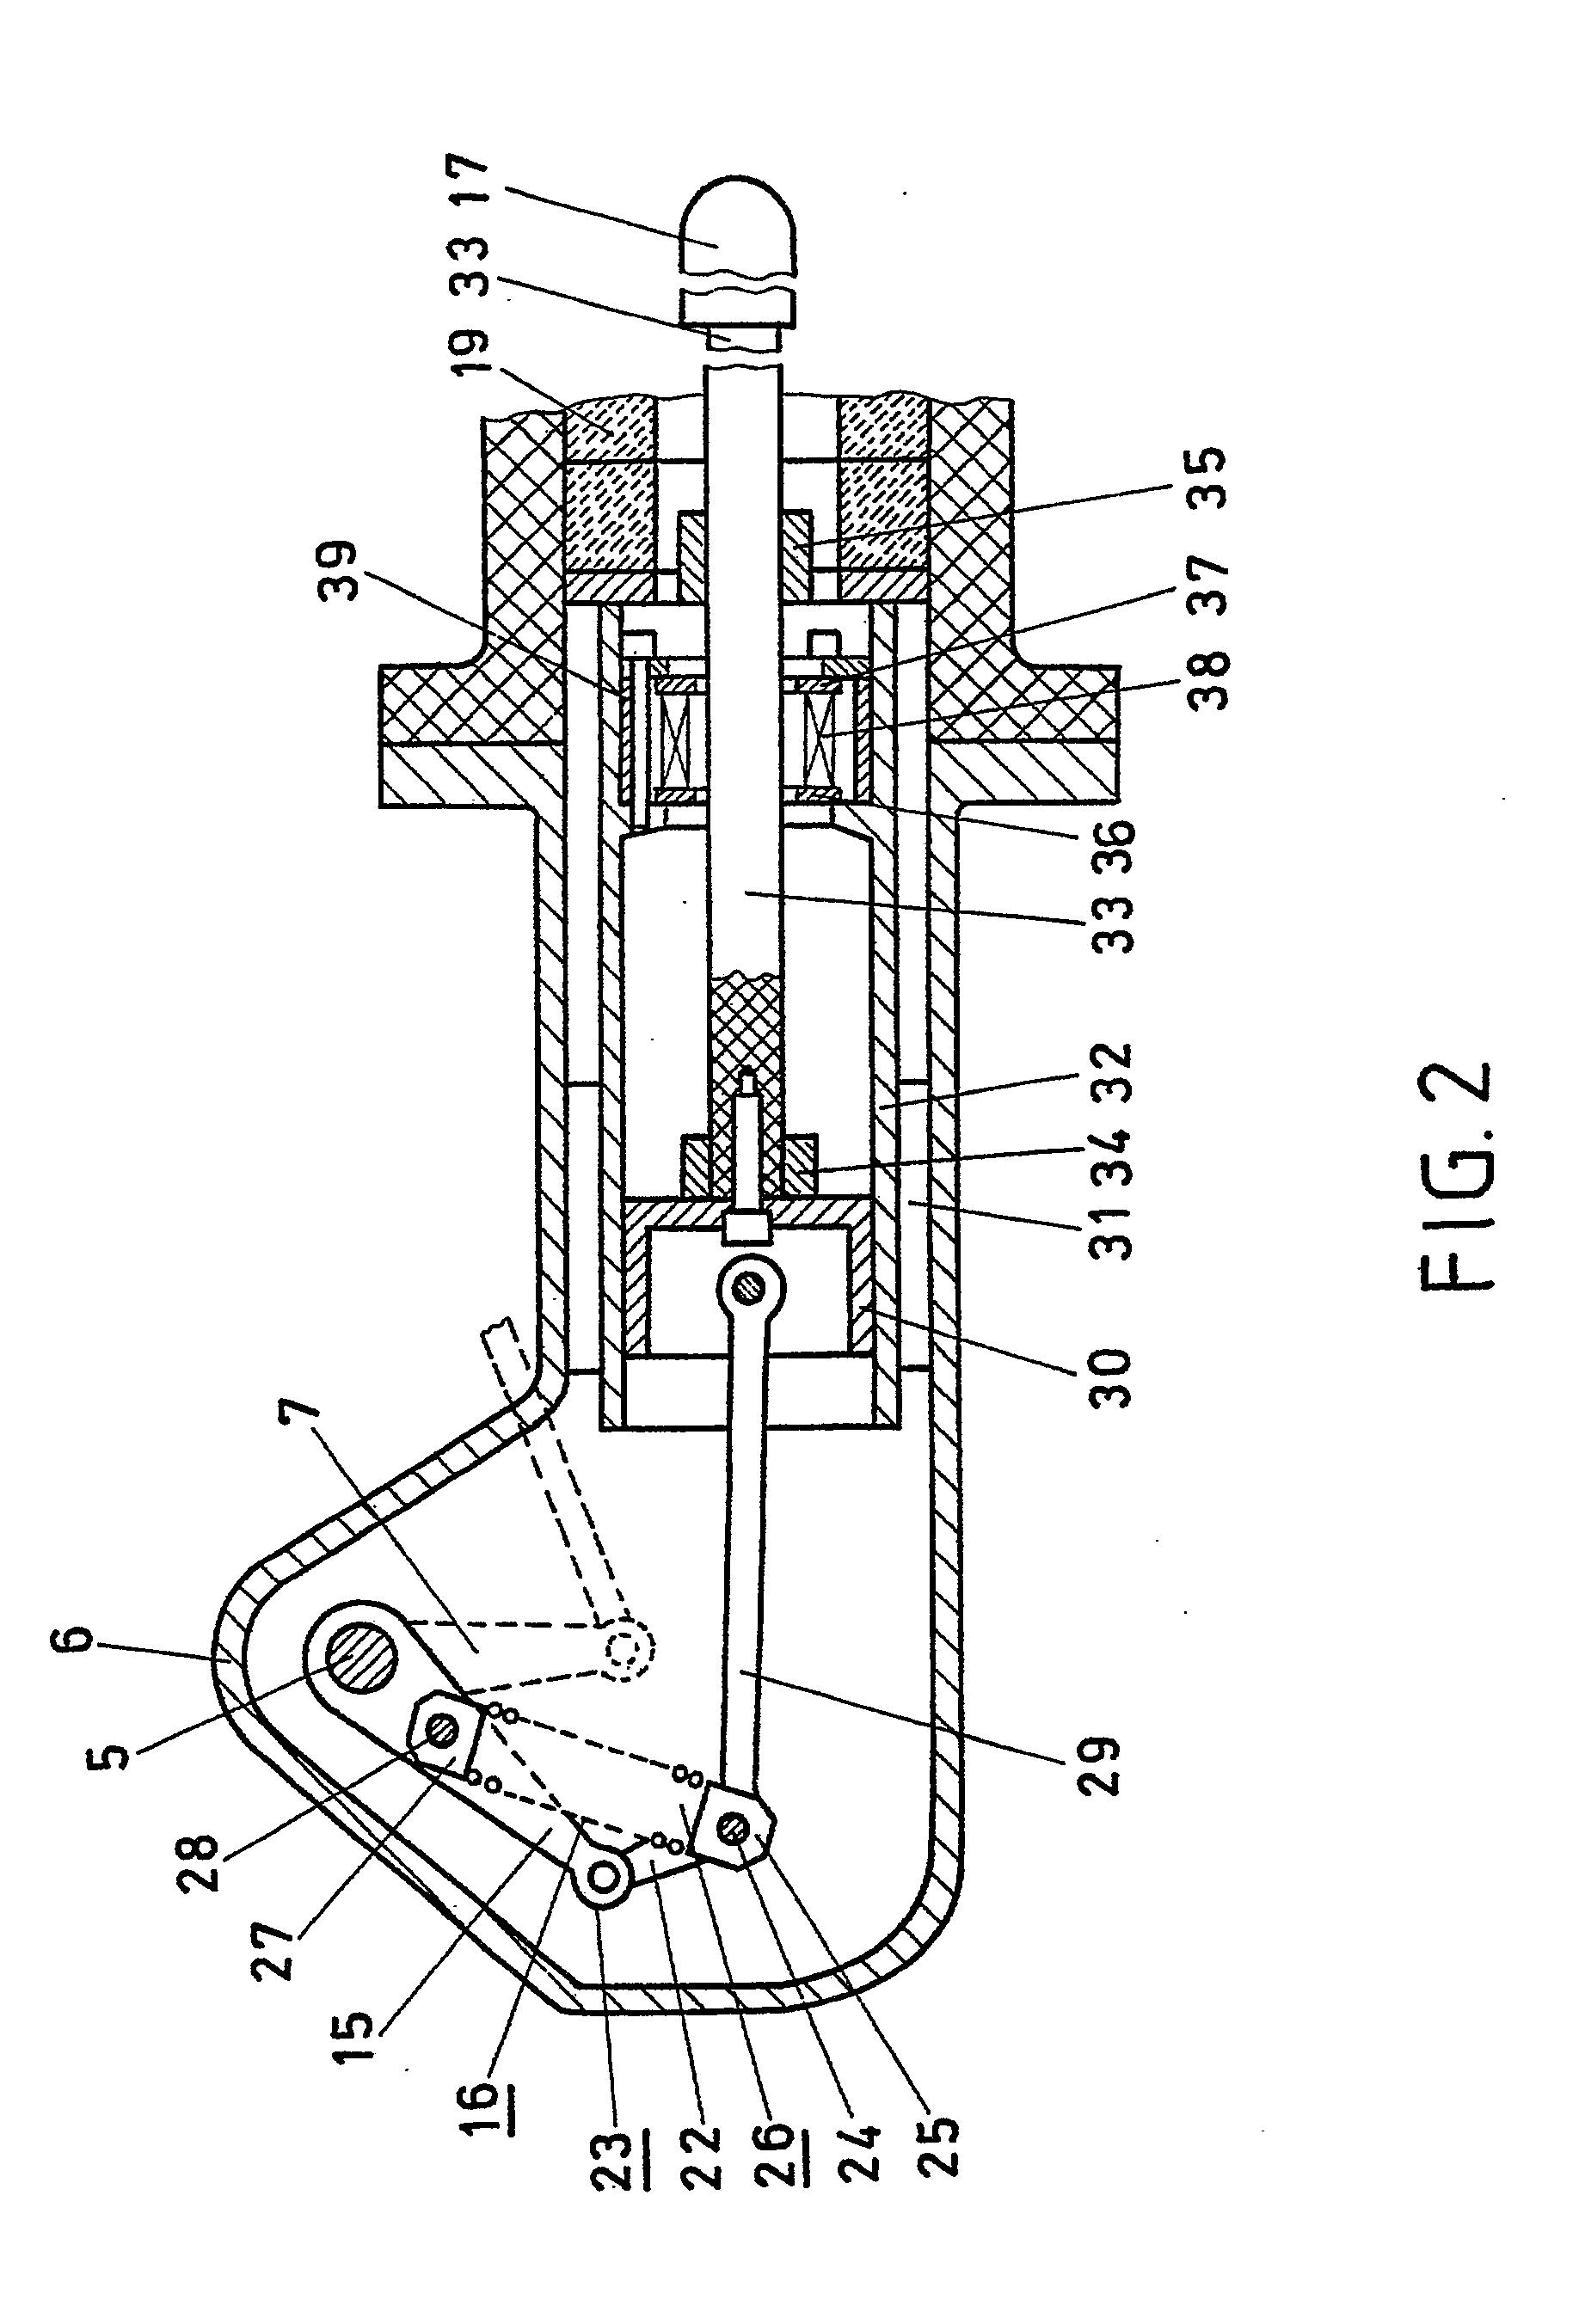 patent ep0197339b1 - high tension circuit breaker with closing resistor